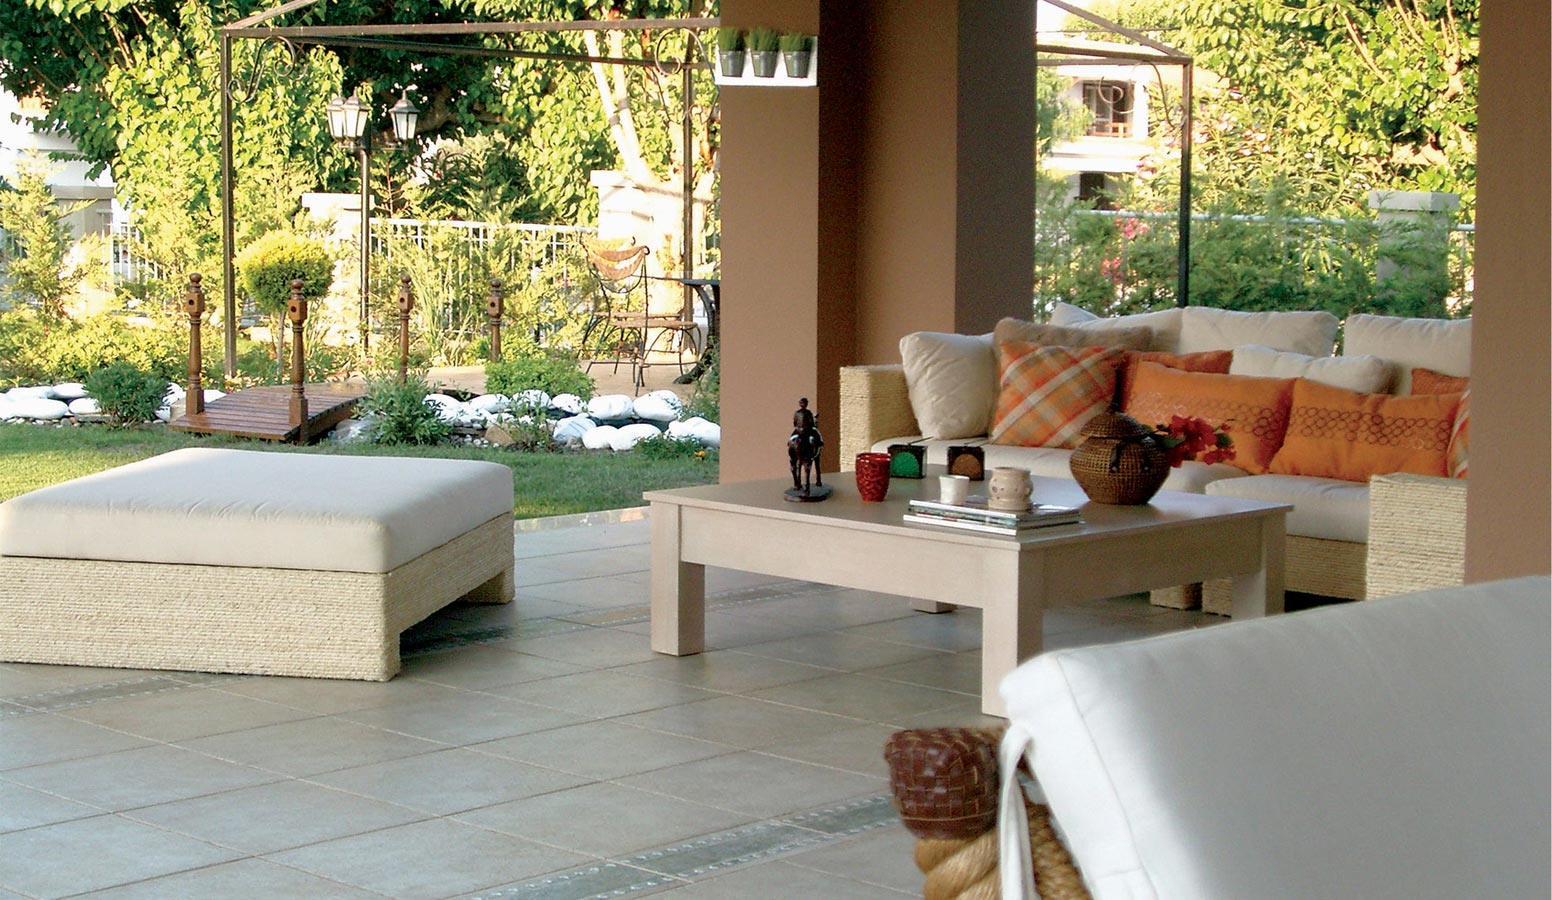 Cyssus Villaları bahçe